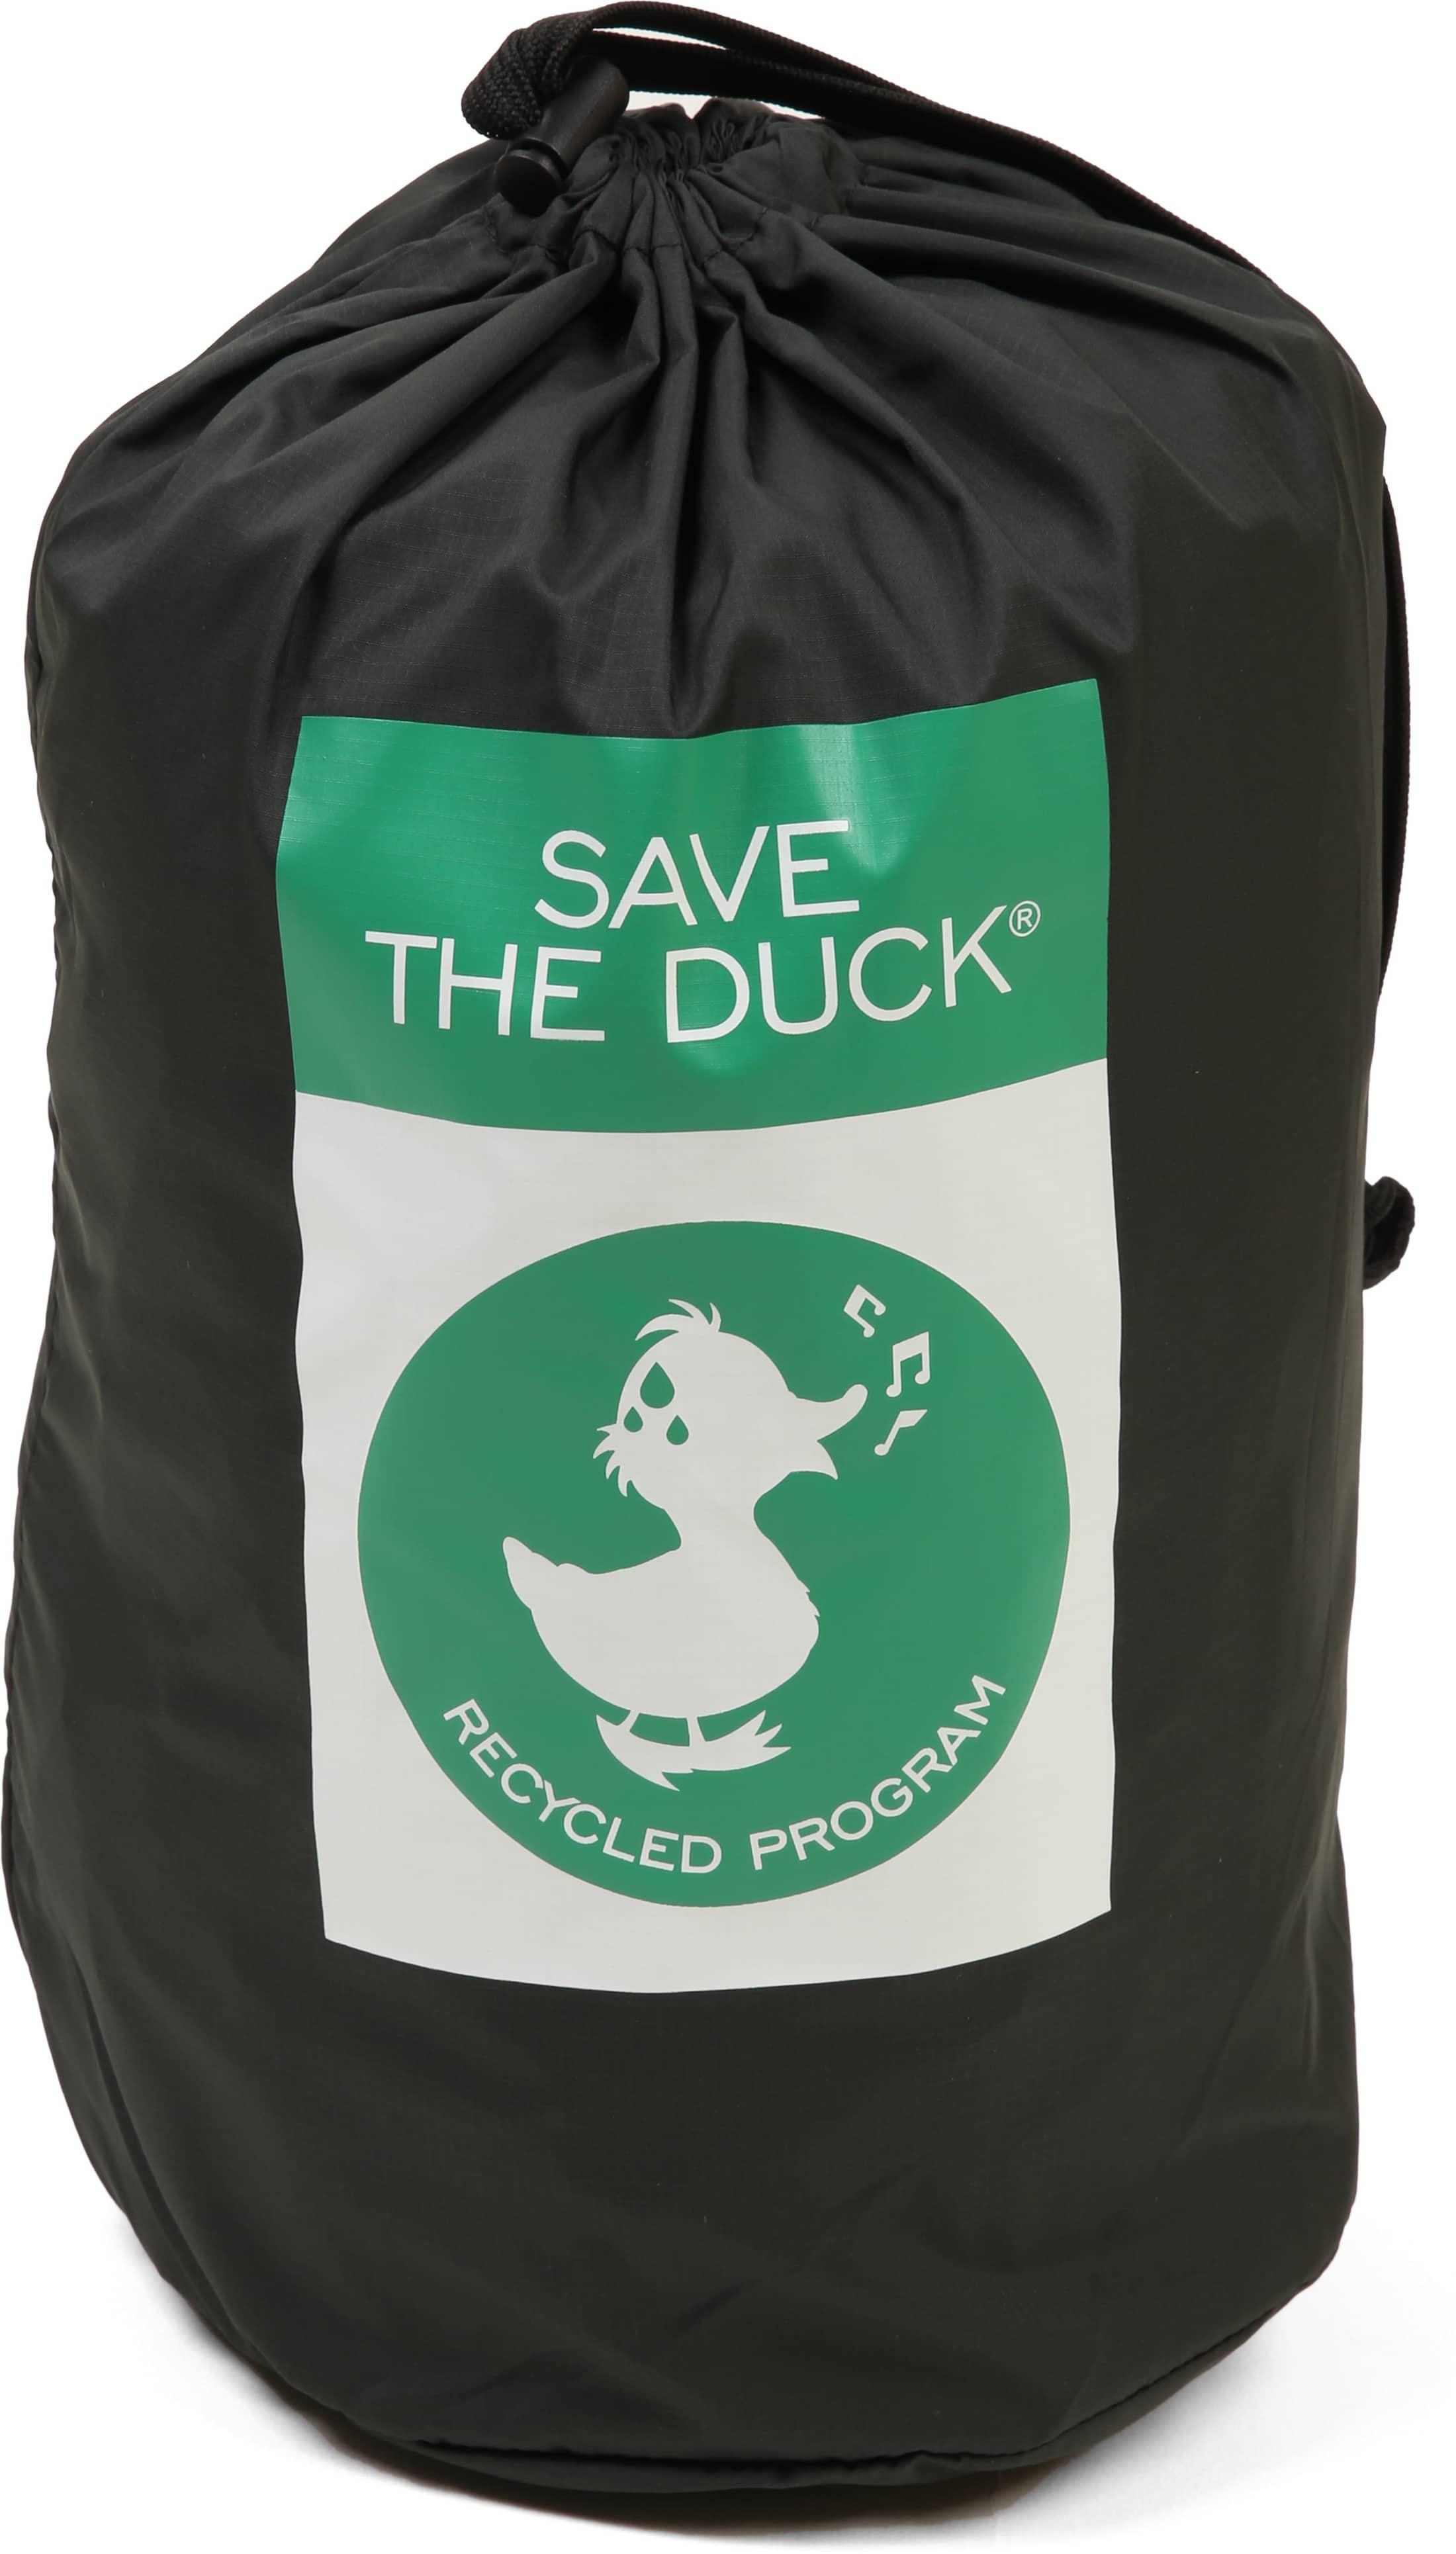 Save the Duck Jack Taglia Revers foto 11